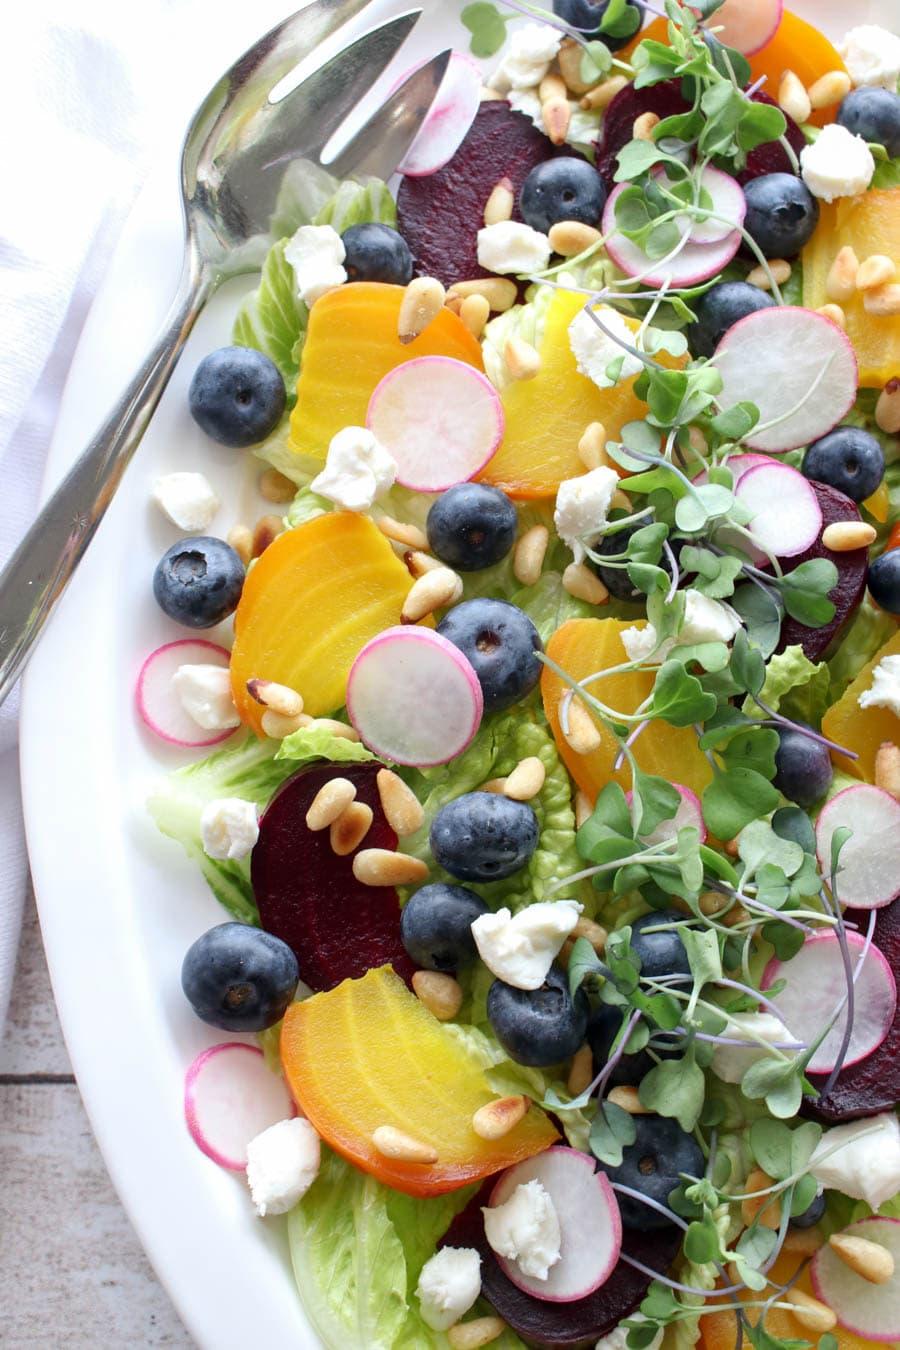 Platter of beet salad